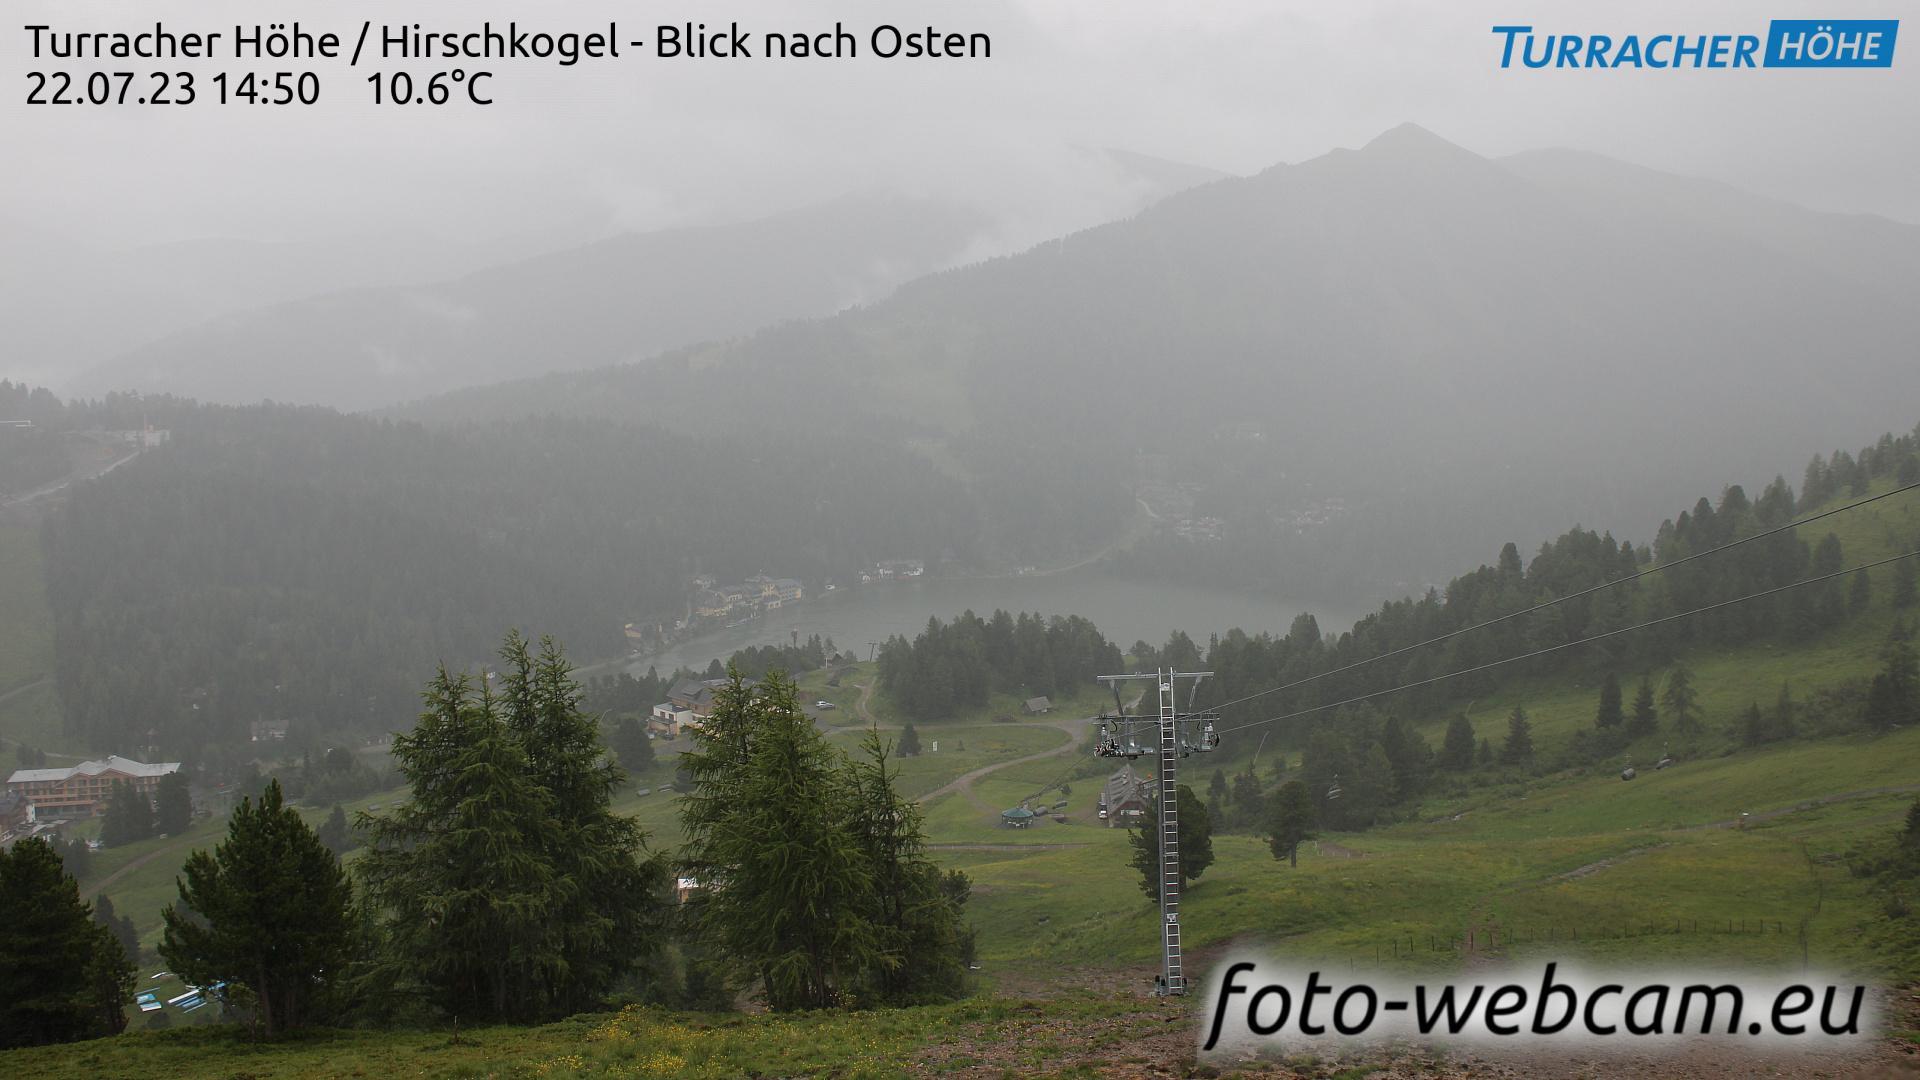 Webcam Brandstätter: Turracher Höhe − Hirschkogel − Blick